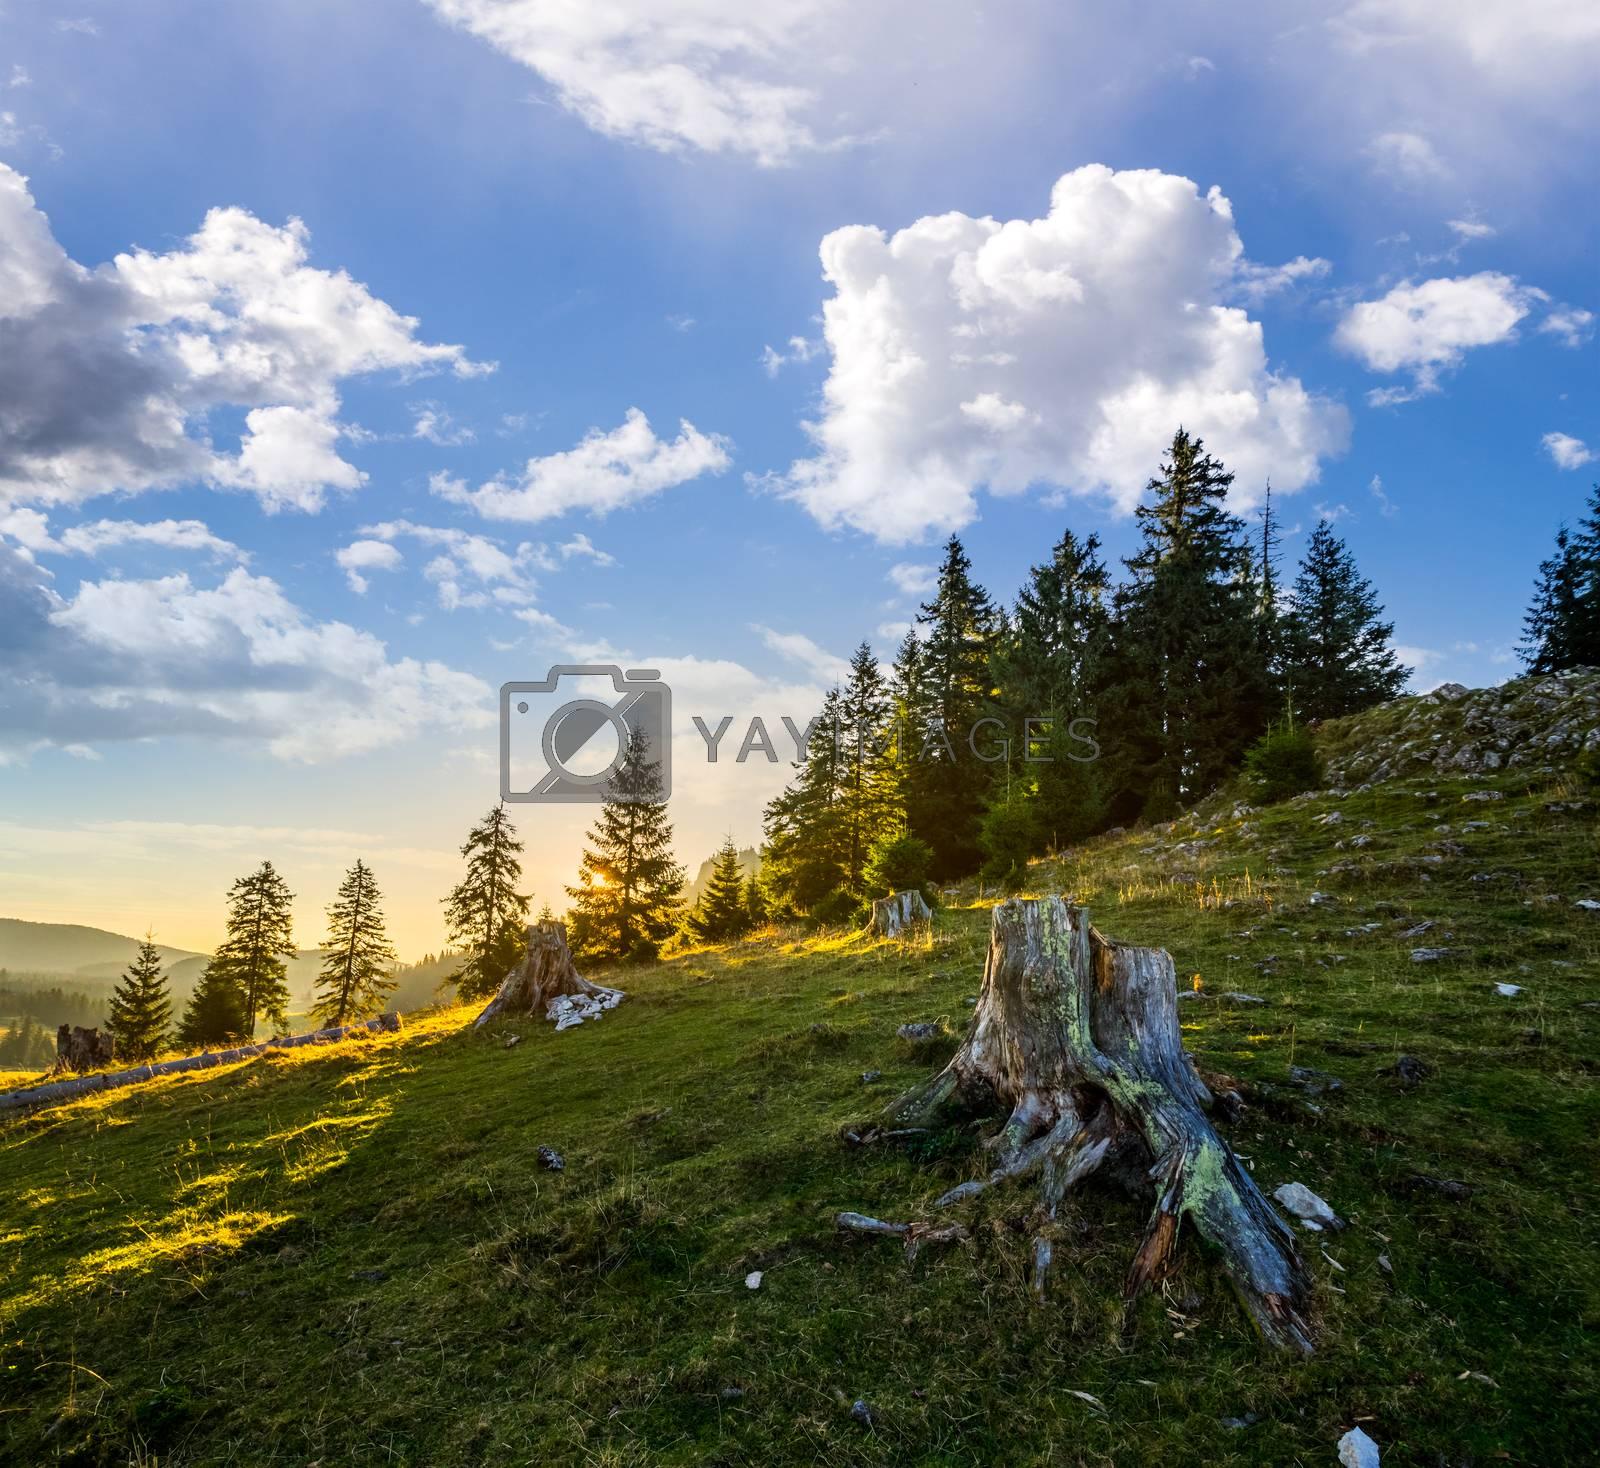 stump infront of fir forest on hillside at sunrise by Pellinni